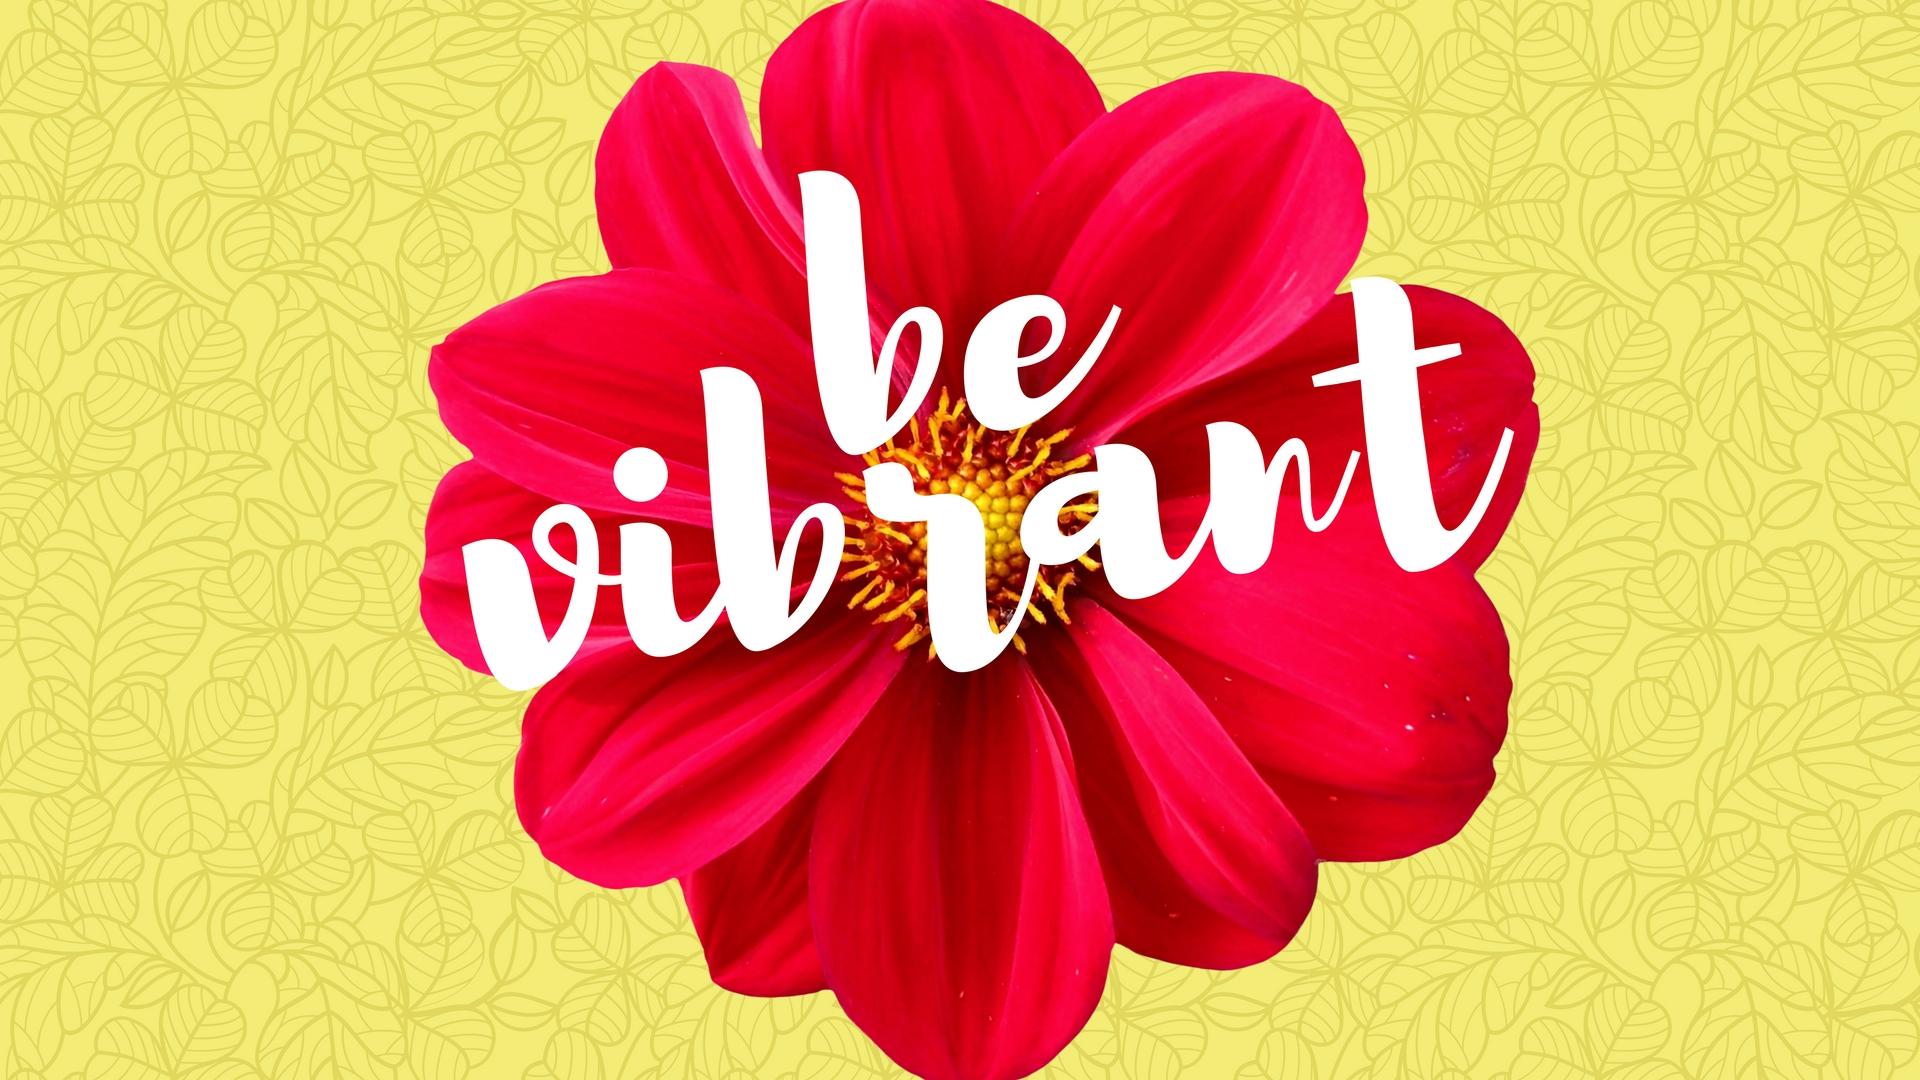 be vibrant wallpaper wednesday eryn rochelle